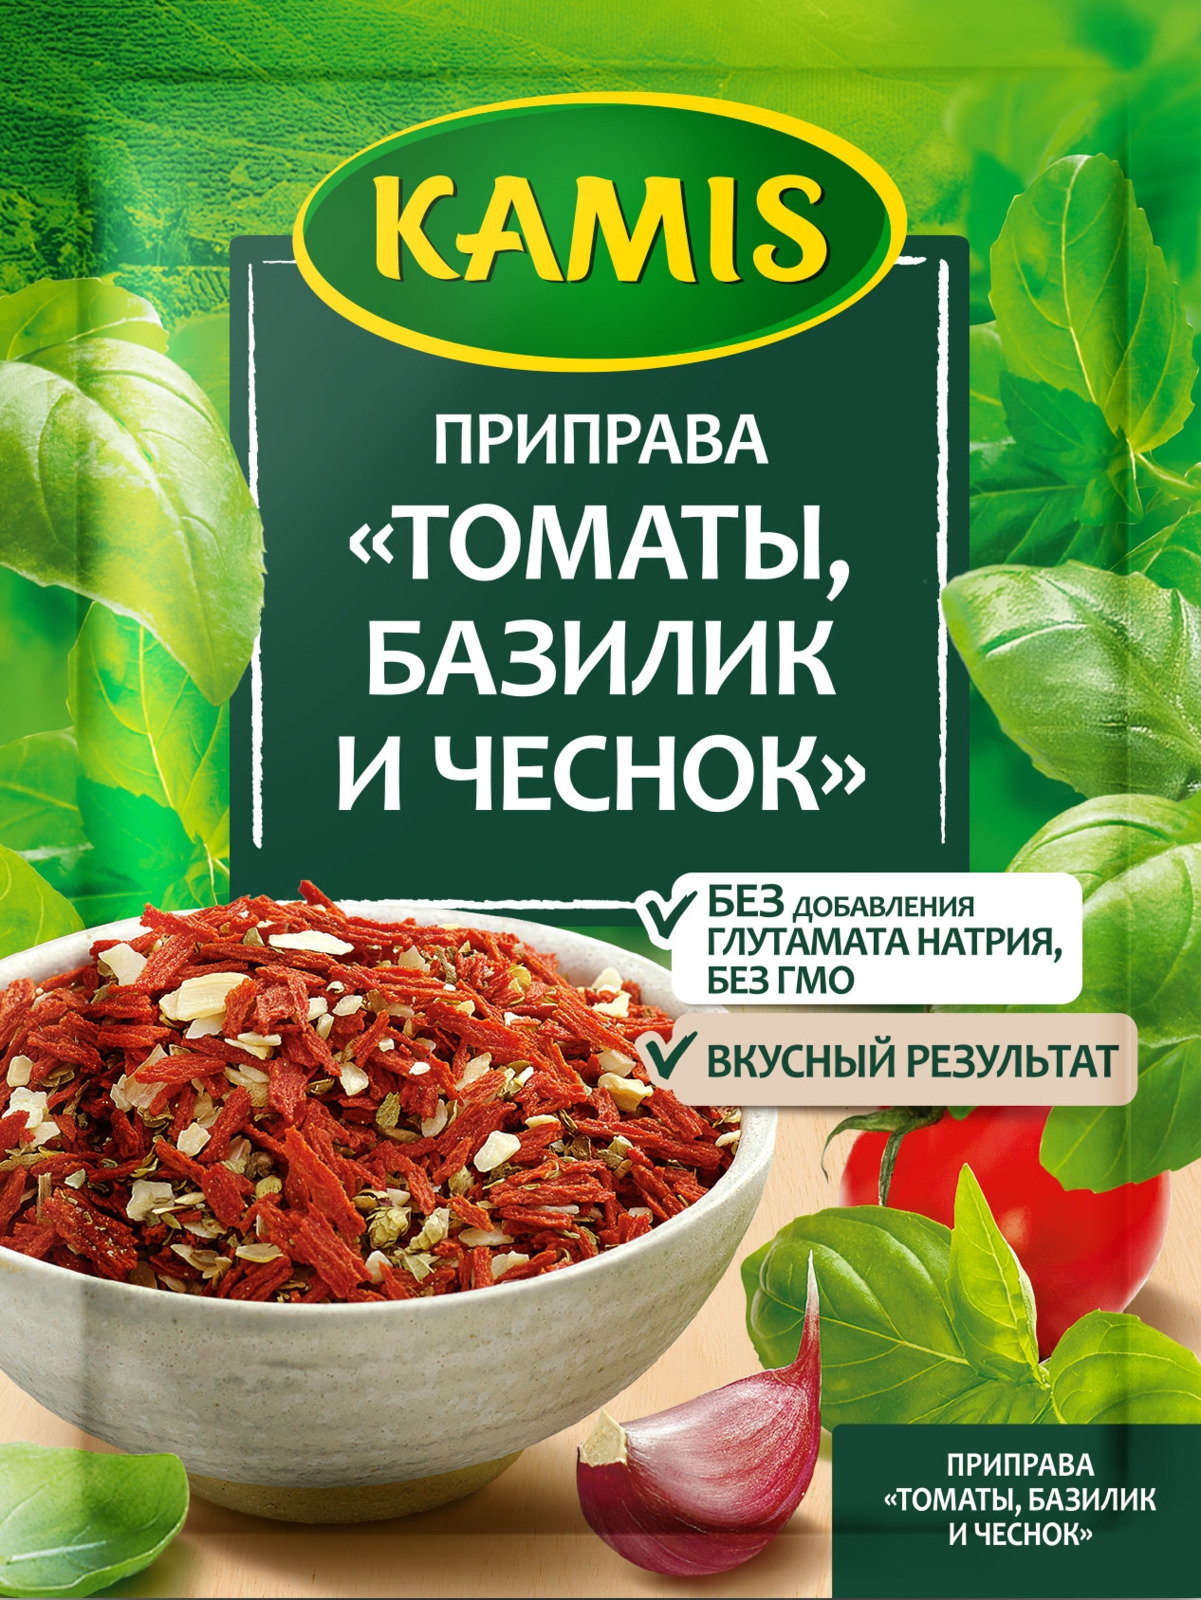 Приправа Kamis Томаты, базилик и чеснок, 15 г цена